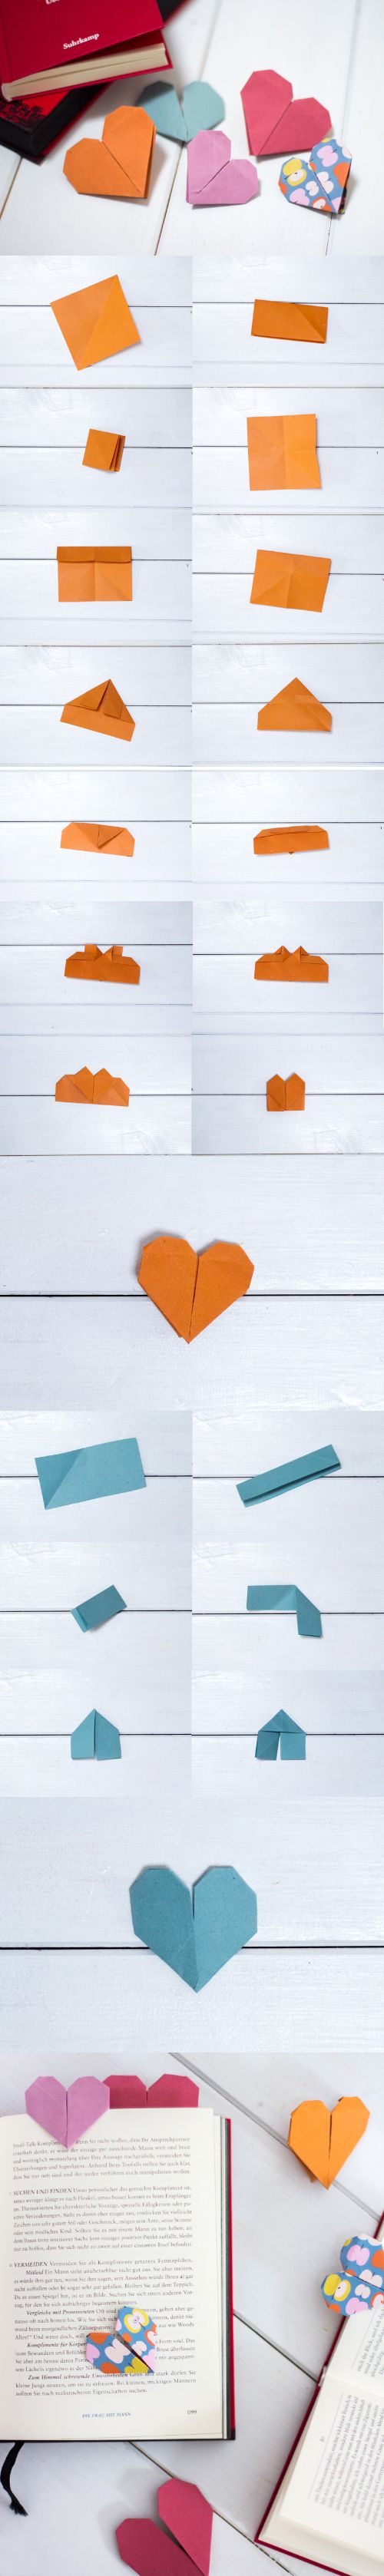 die besten 25 origami herzen ideen auf pinterest. Black Bedroom Furniture Sets. Home Design Ideas